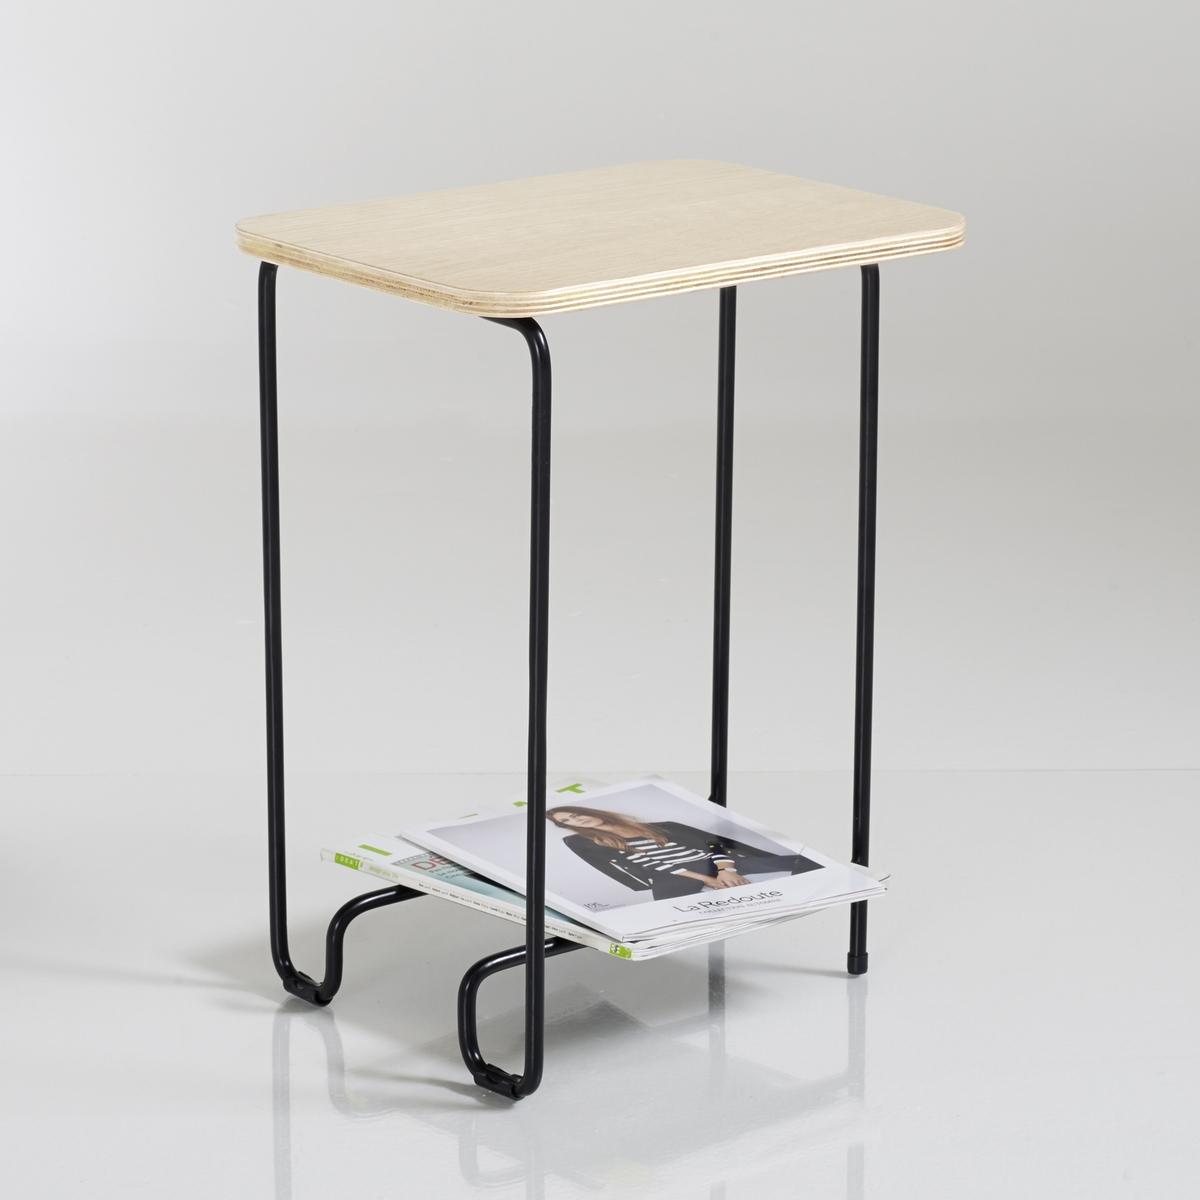 La Redoute Interieurs Столик диванный или журнальный, Kuri